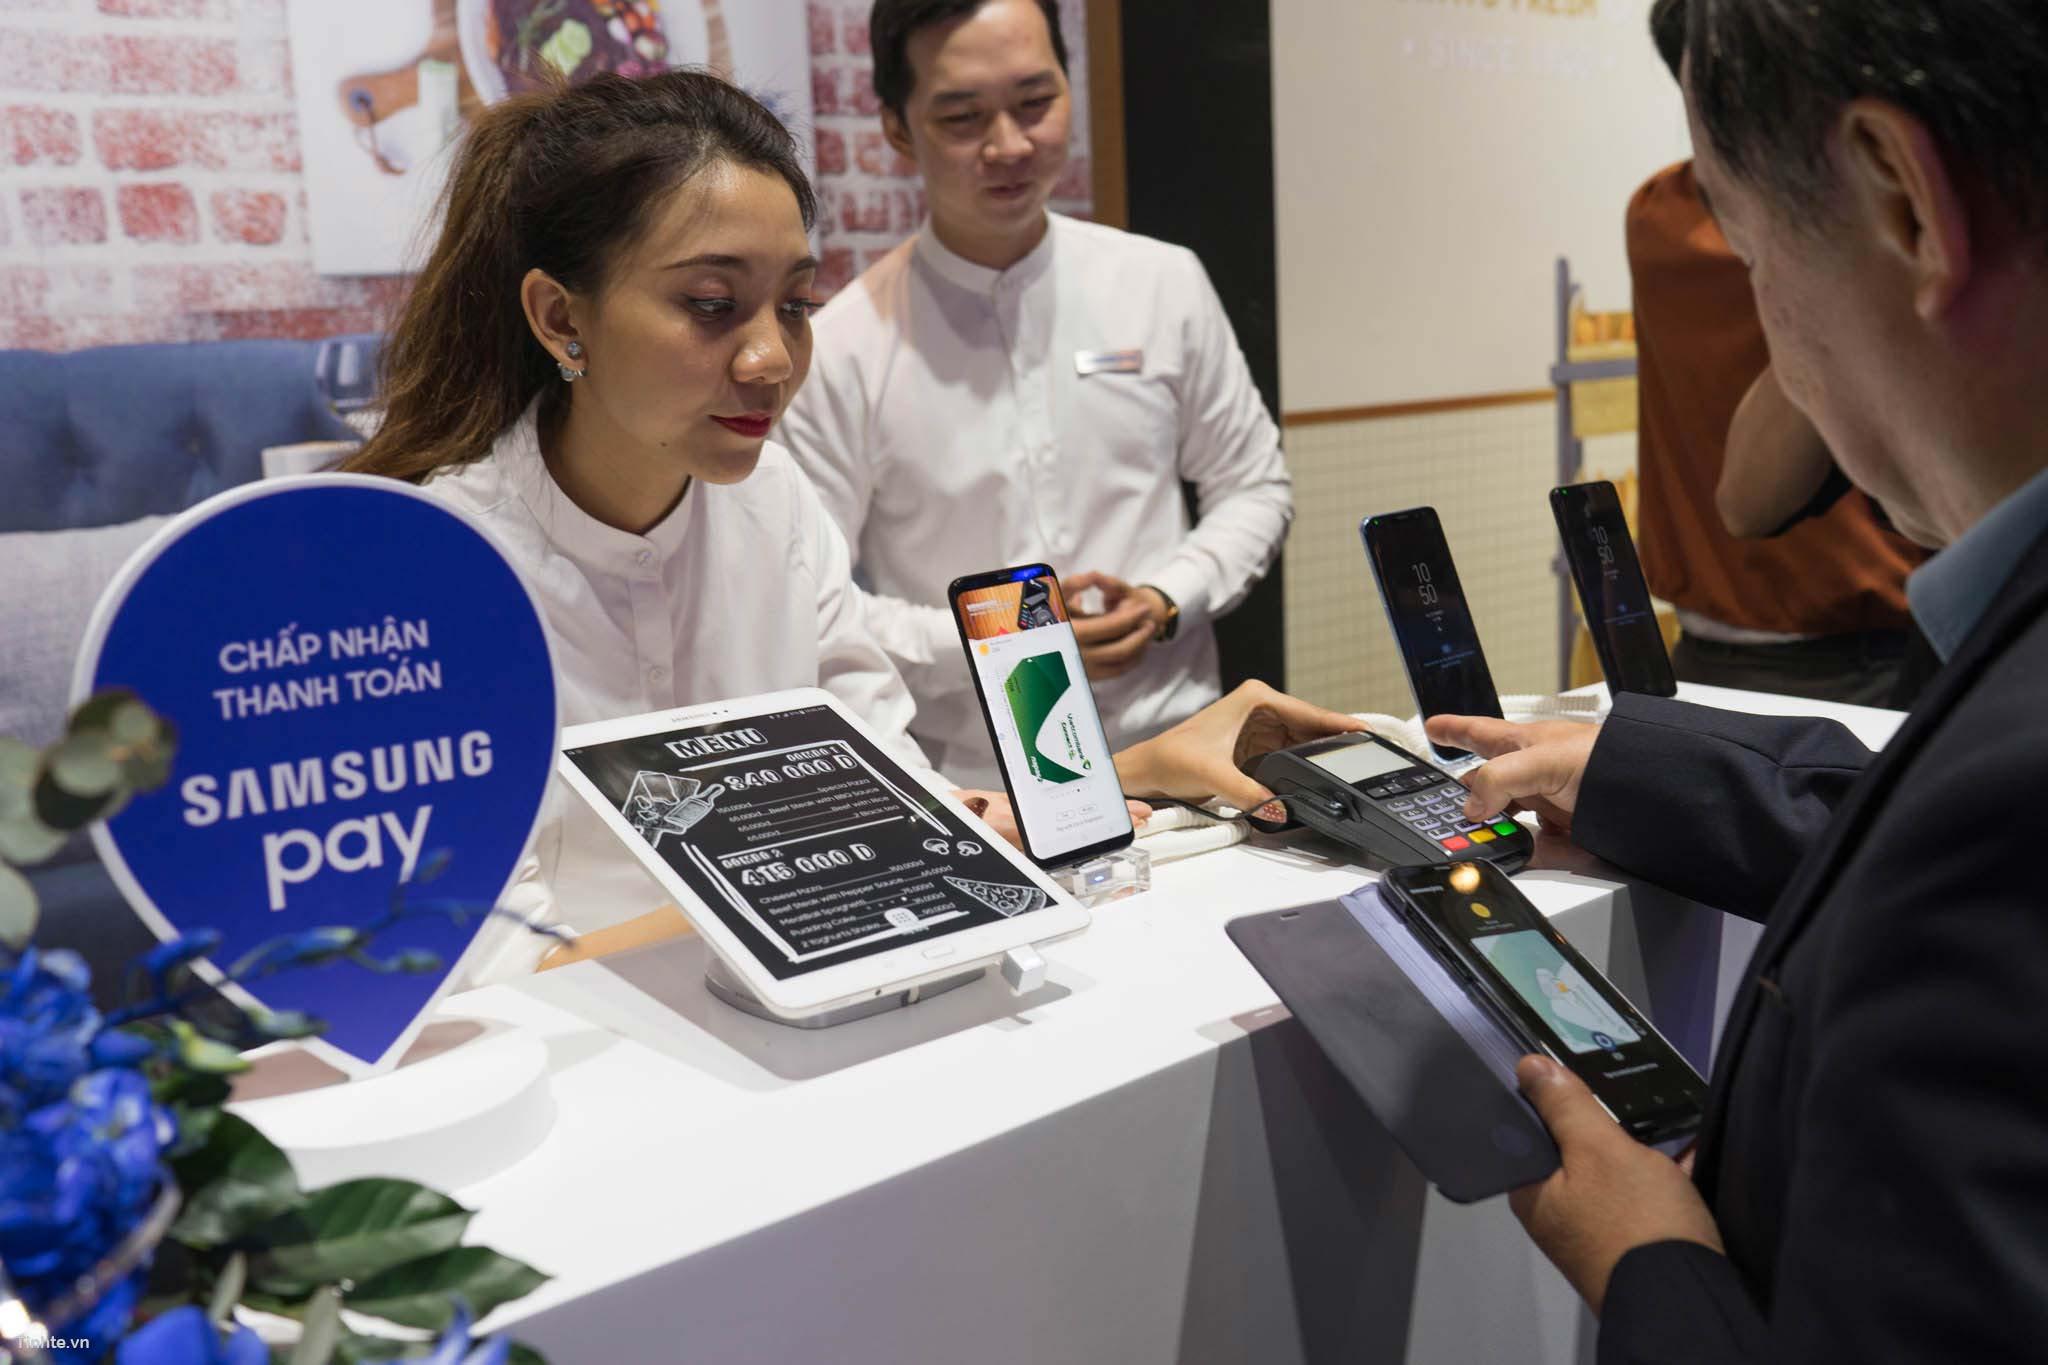 Samsung_pay-10.jpg